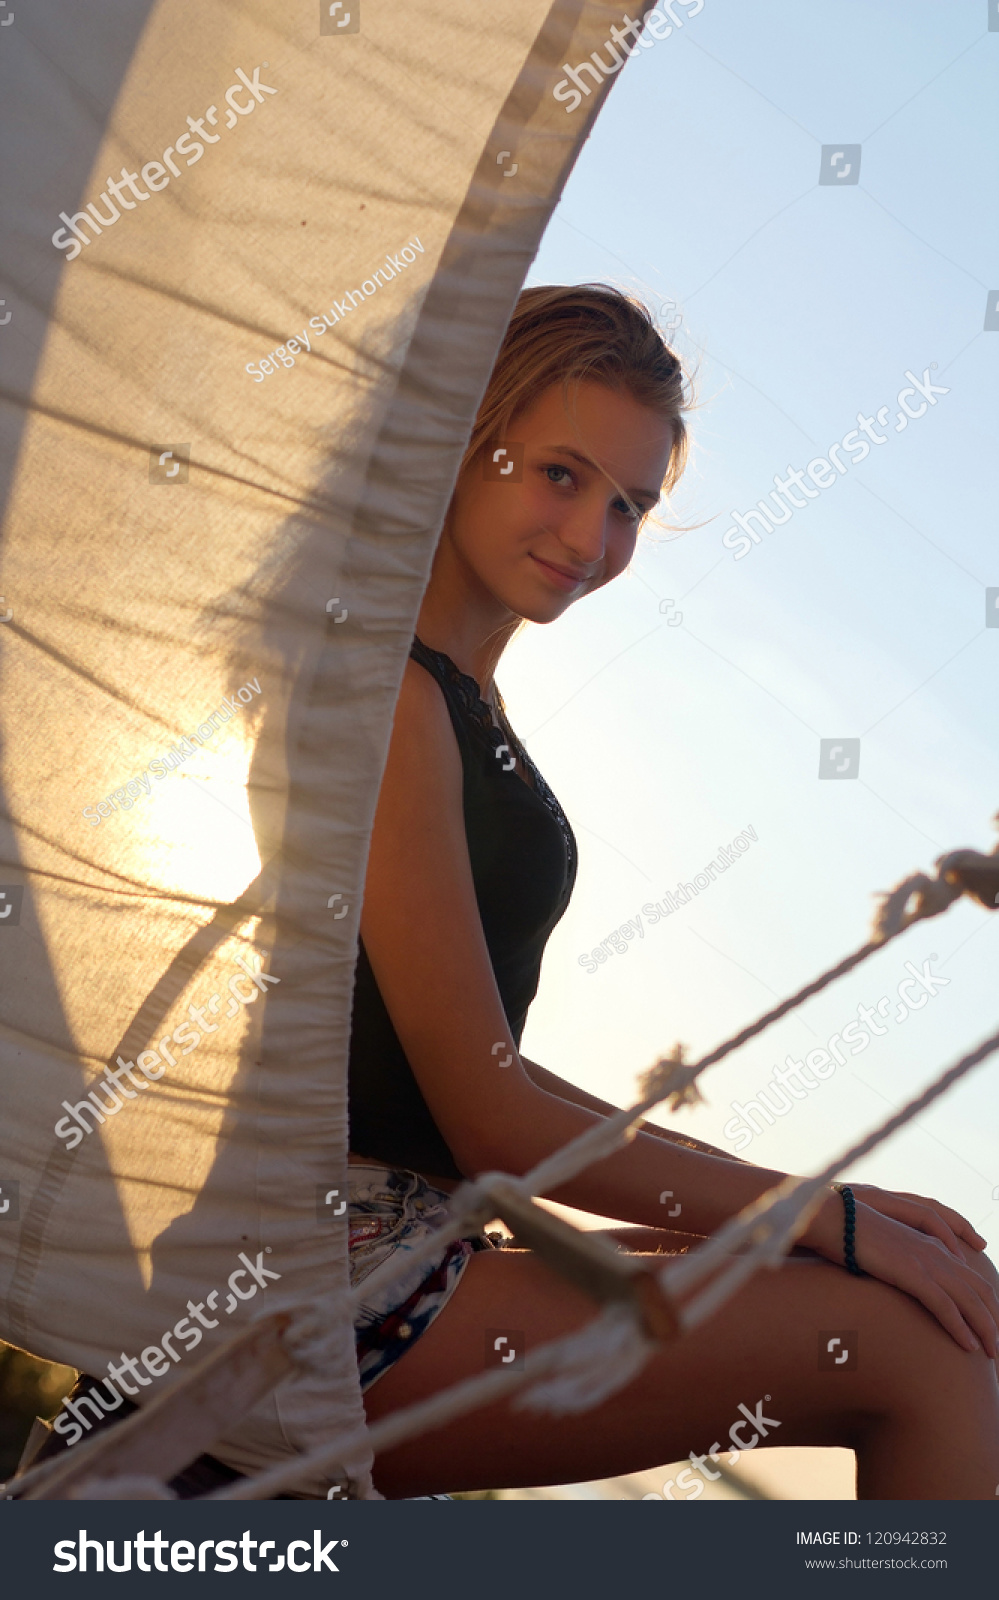 Charming Teen Girl Sitting Stern Ship Stock Photo 120942832 Shutterstock